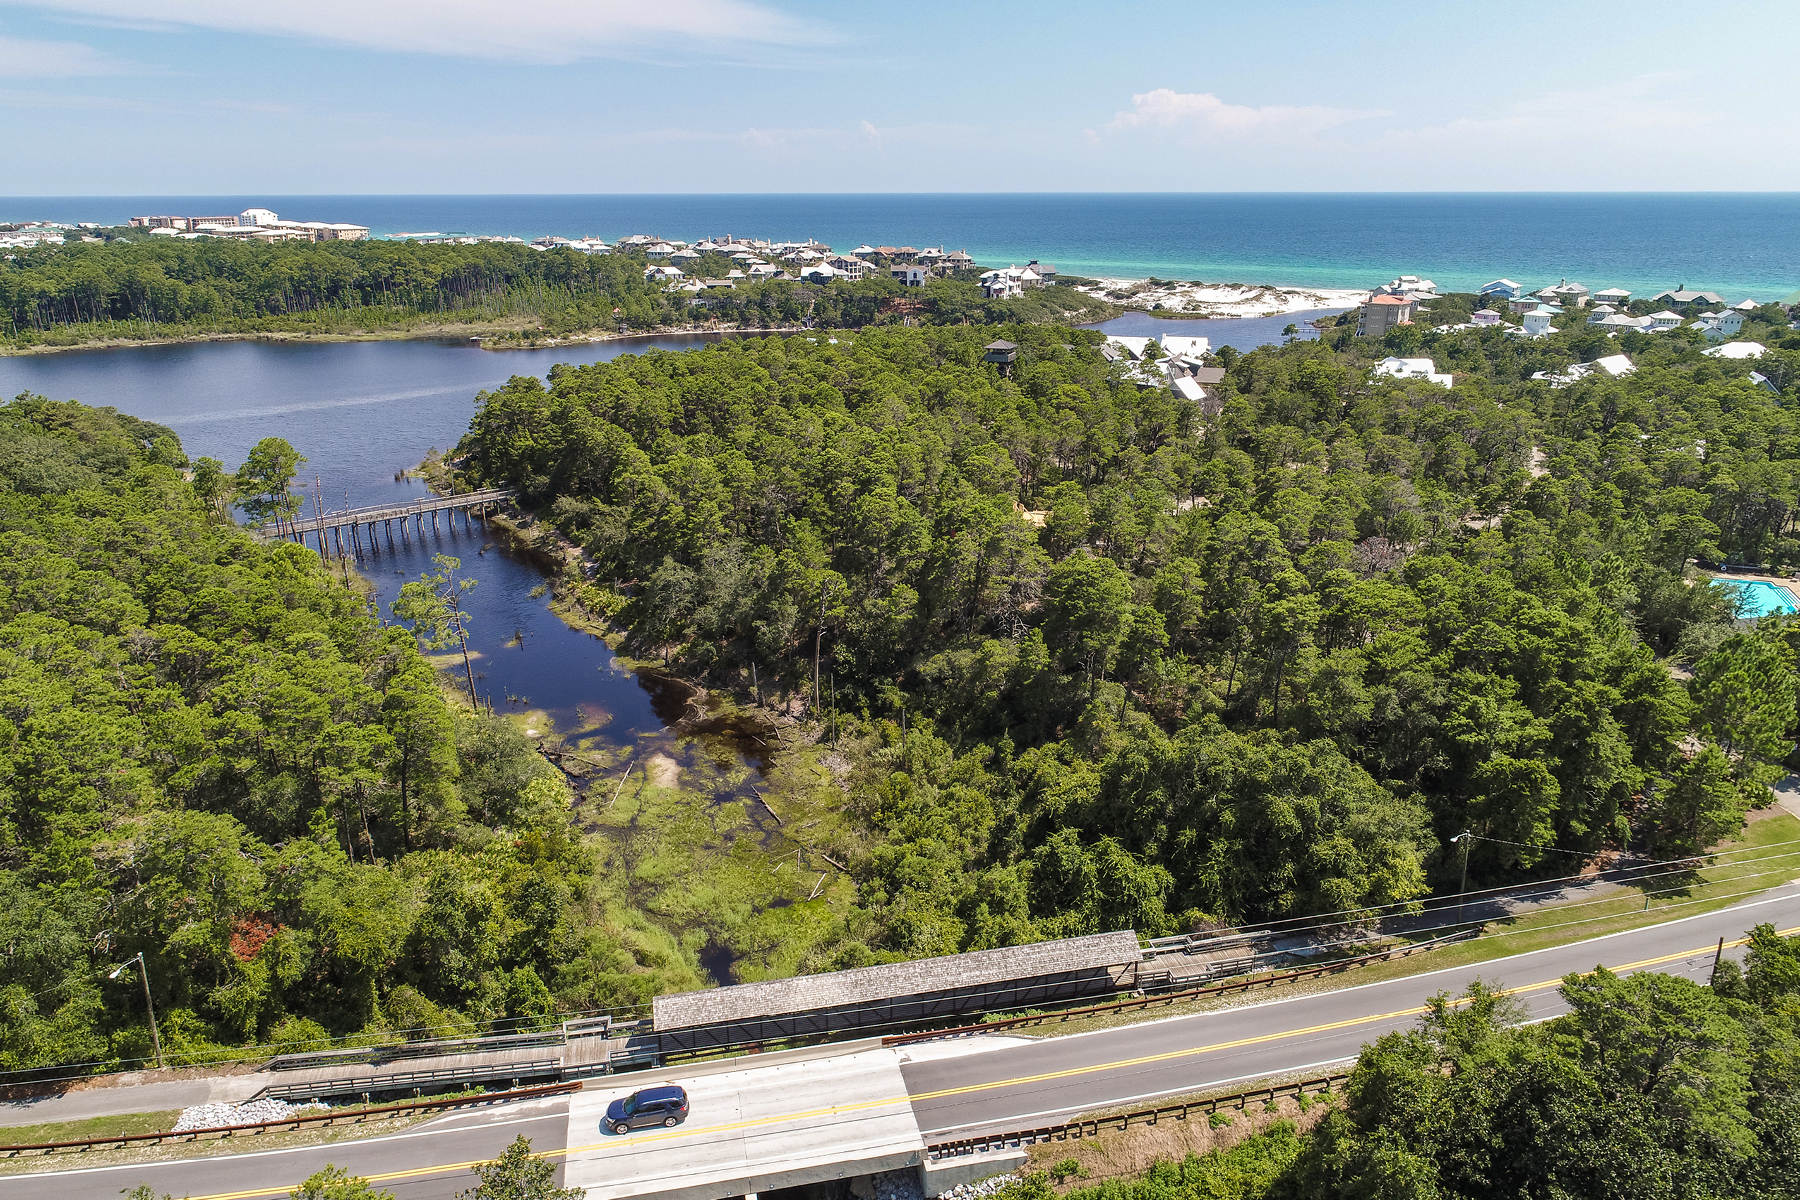 Земля для того Продажа на Lakefront Home Site in Gated 30A Community Lot 3 Block 5 Post Lane, Santa Rosa Beach, Флорида, 32459 Соединенные Штаты